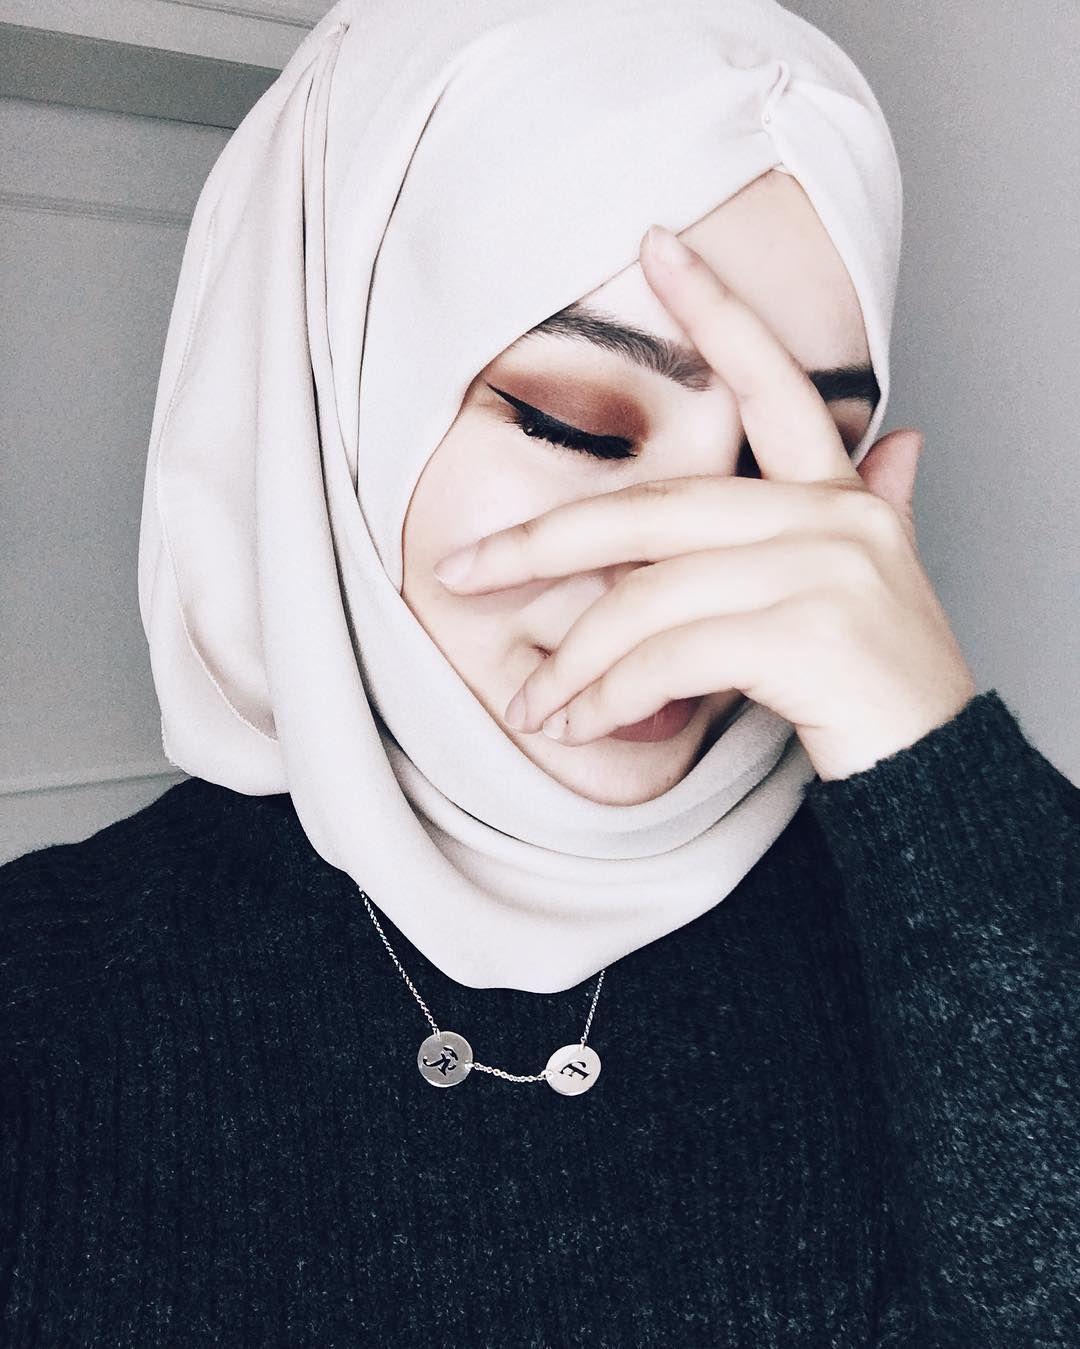 Картинки на аву мусульманка без лица